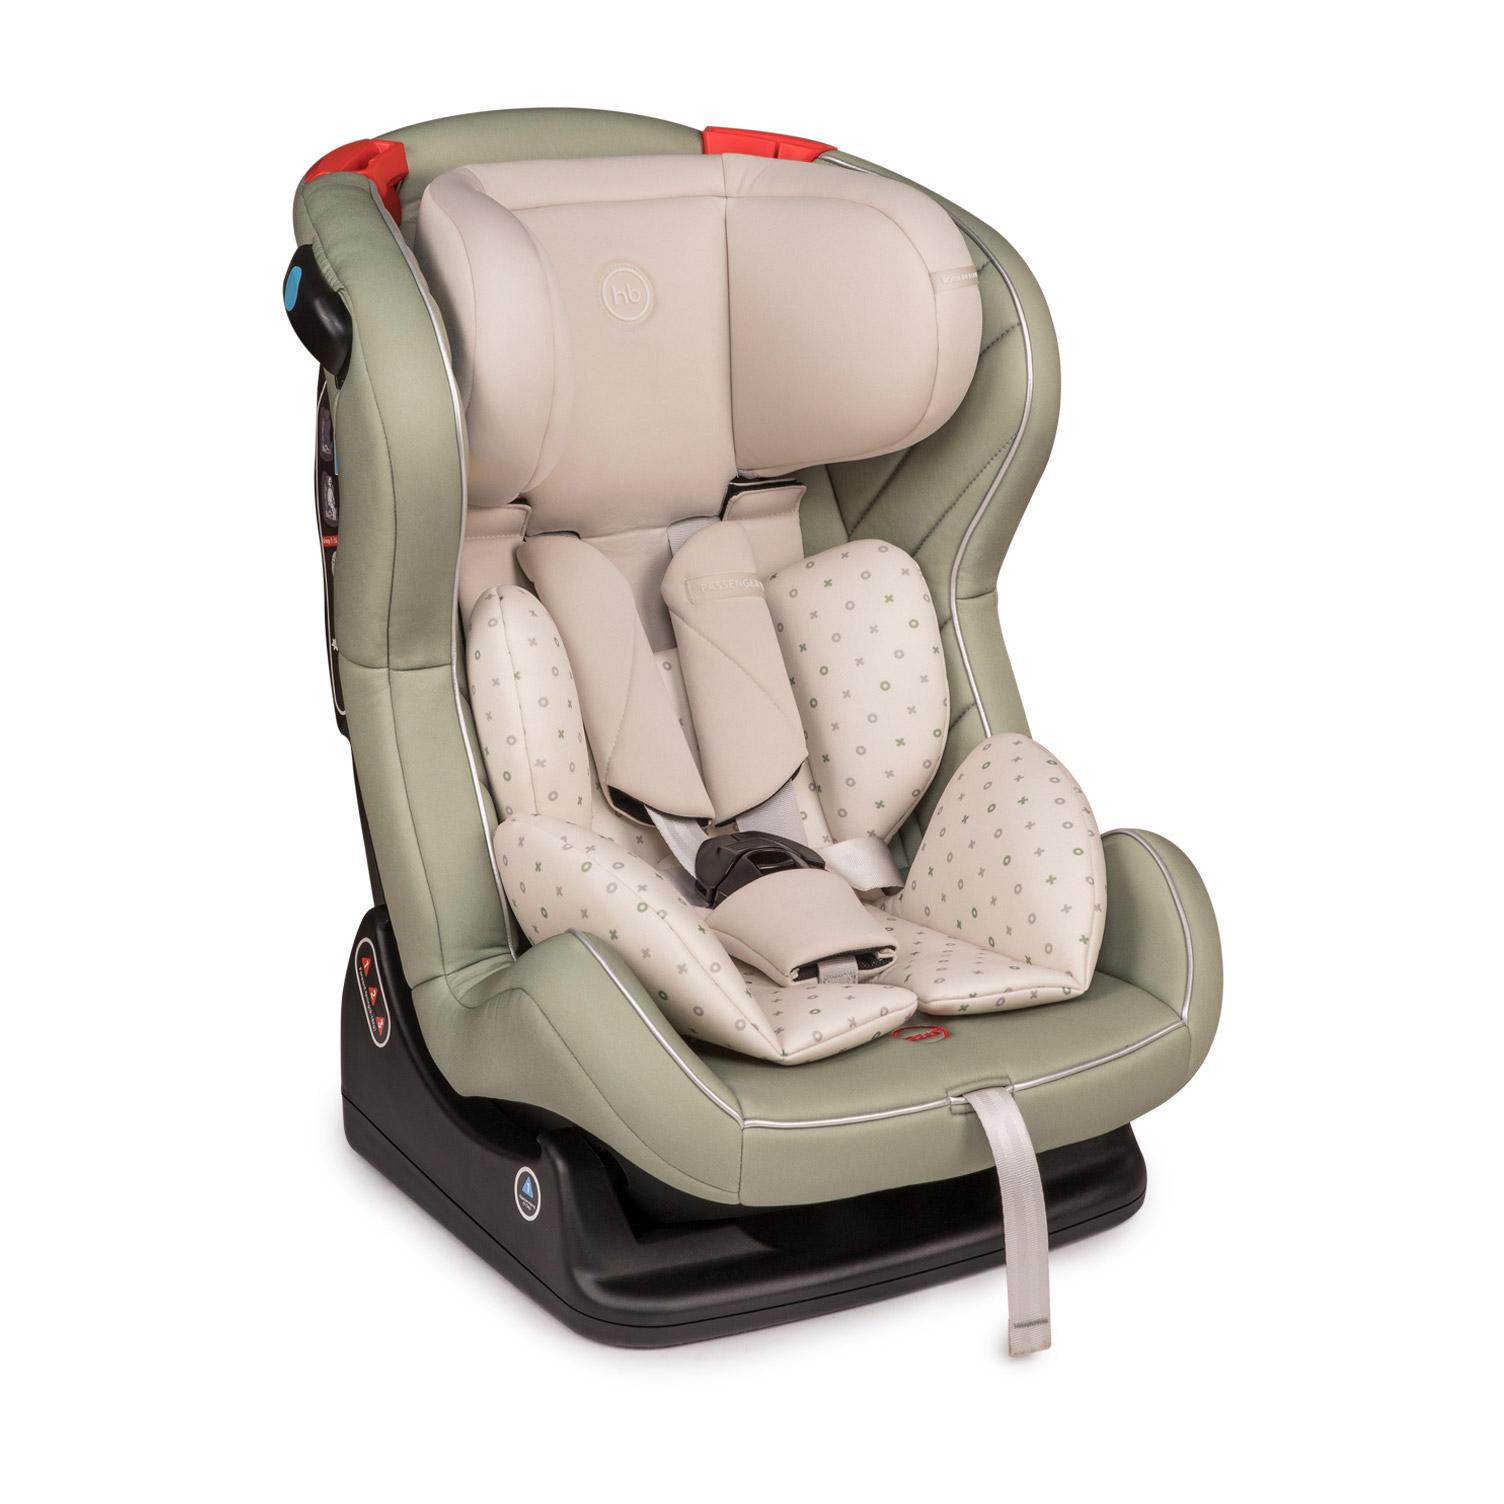 Фото - Автокресло Happy Baby Passenger V2 green автокресло happy baby passenger v2 graphite черный